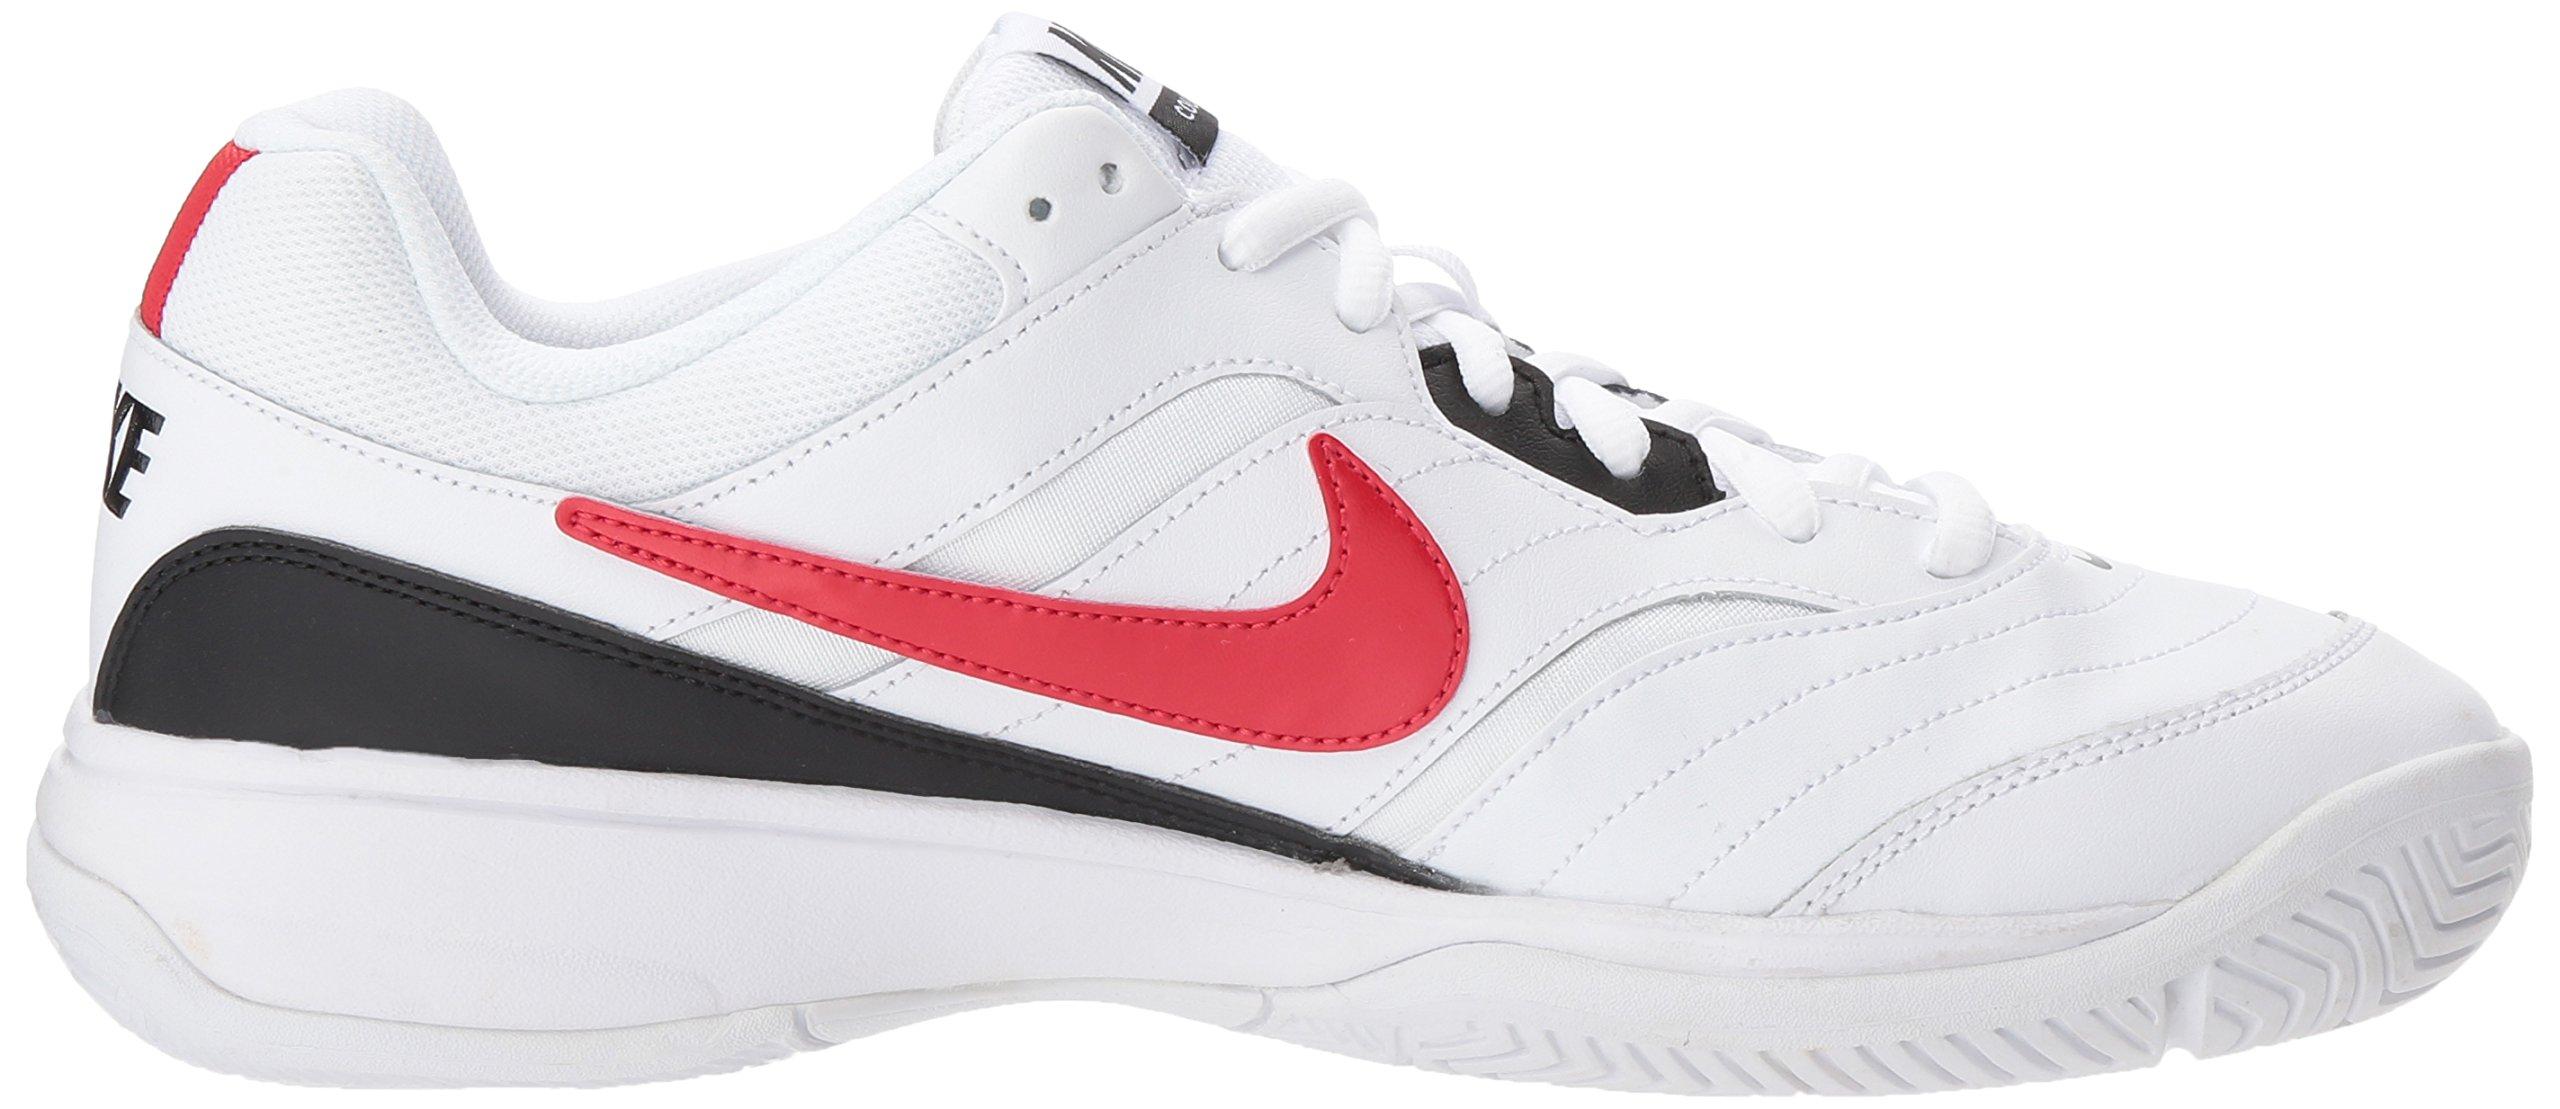 Nike Men's Court Lite Tennis Shoe, White/University red/Black, 7.5 D US by Nike (Image #7)